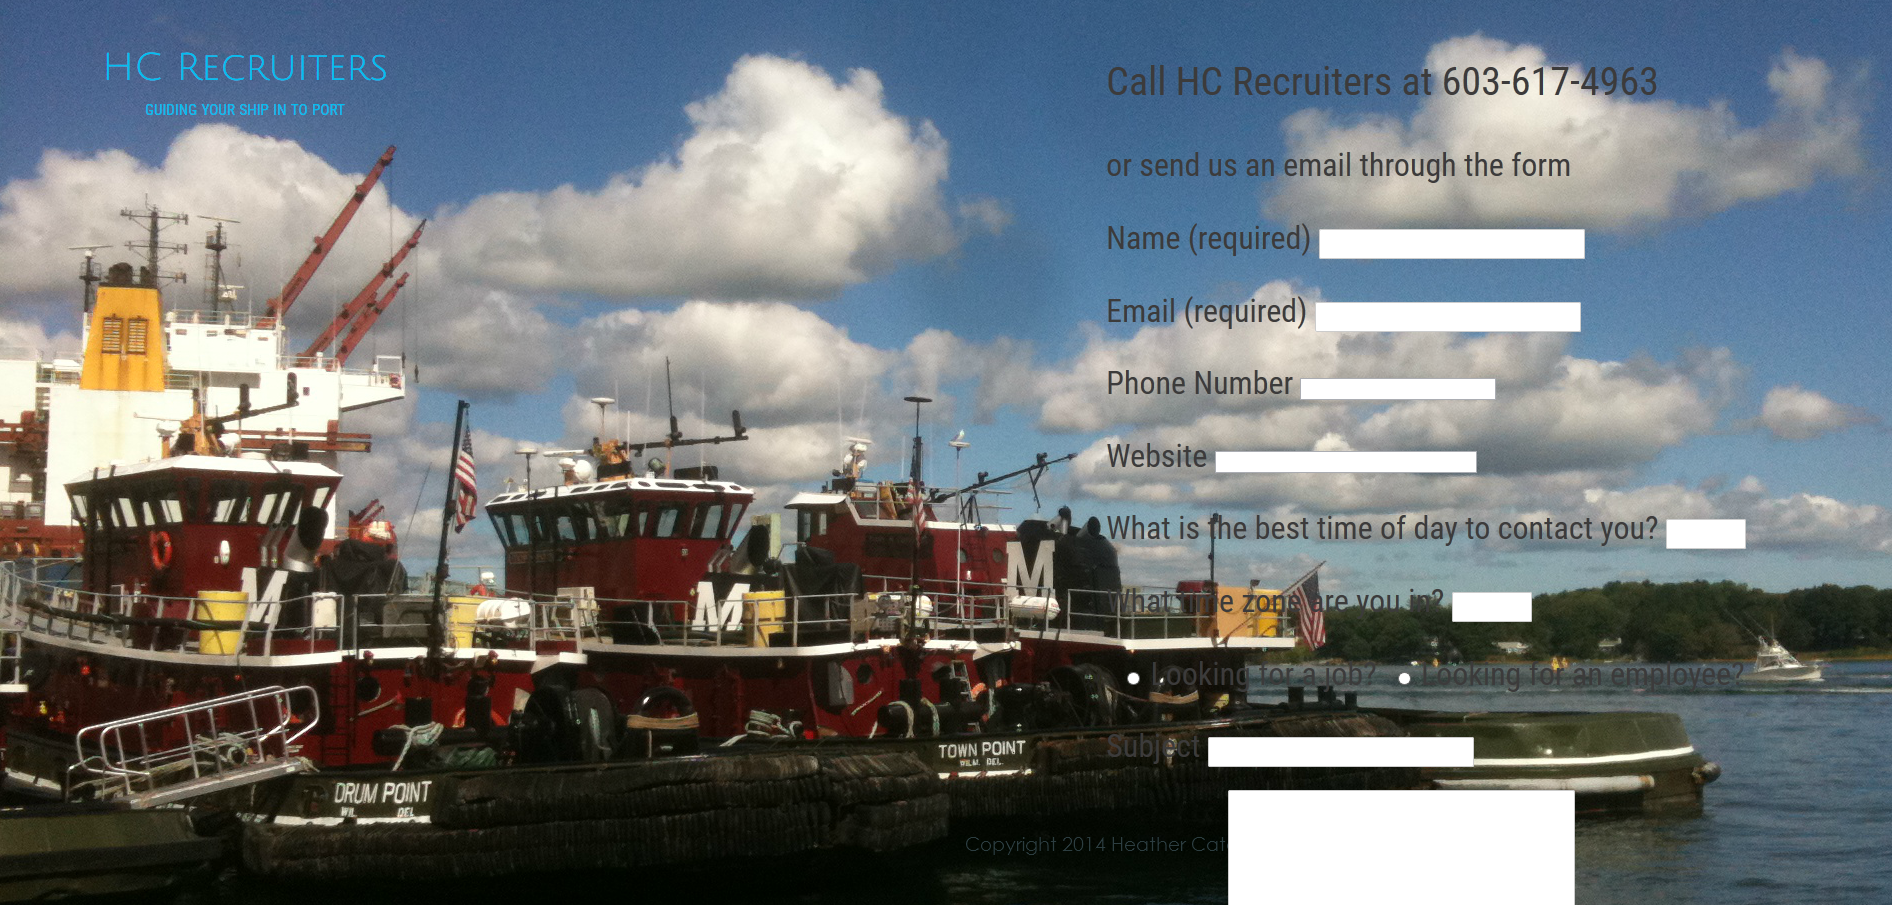 HCRcontact